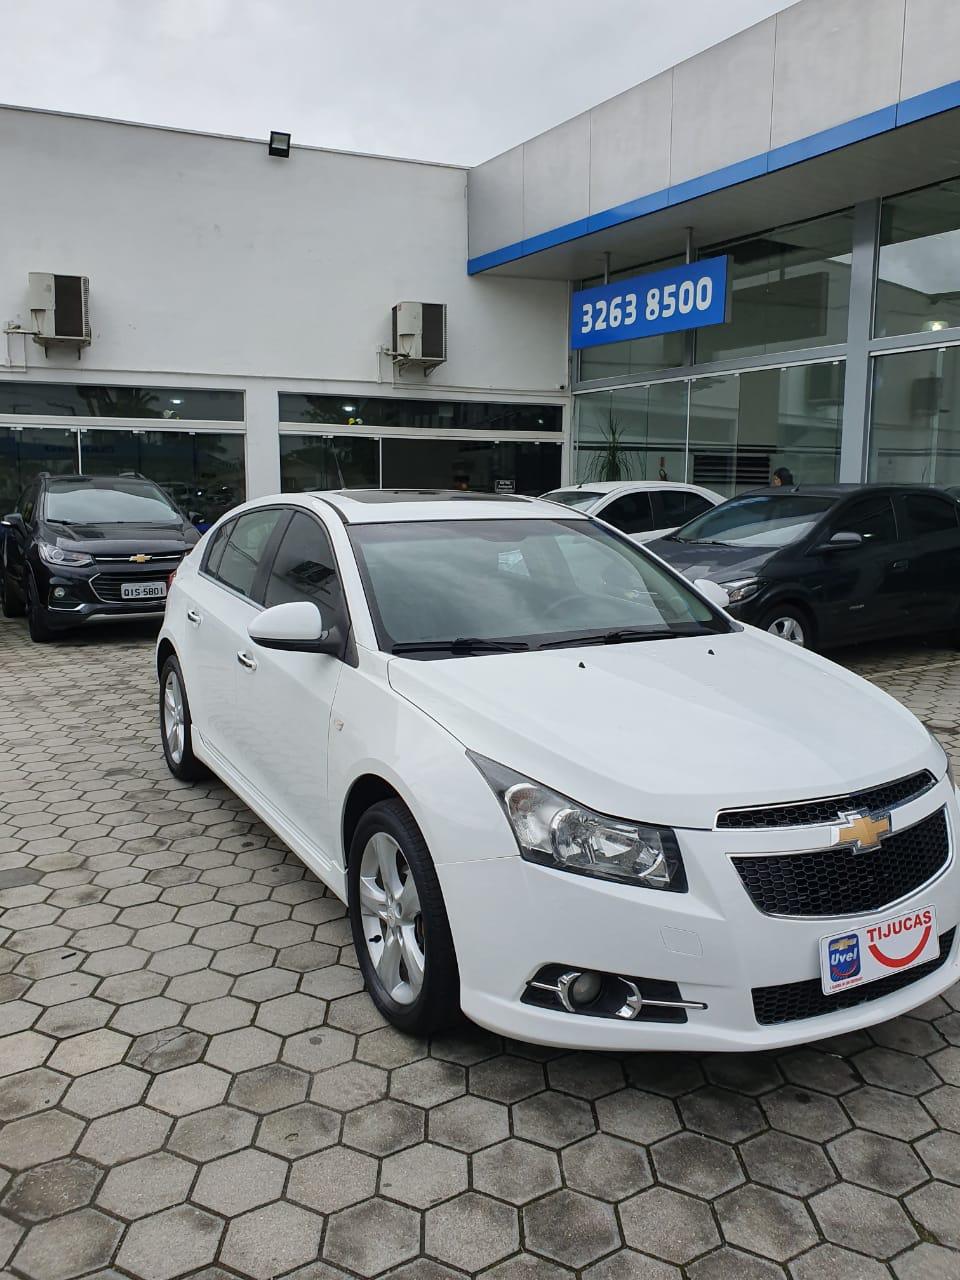 Chevrolet Cruze LTZ 1.8L 2014